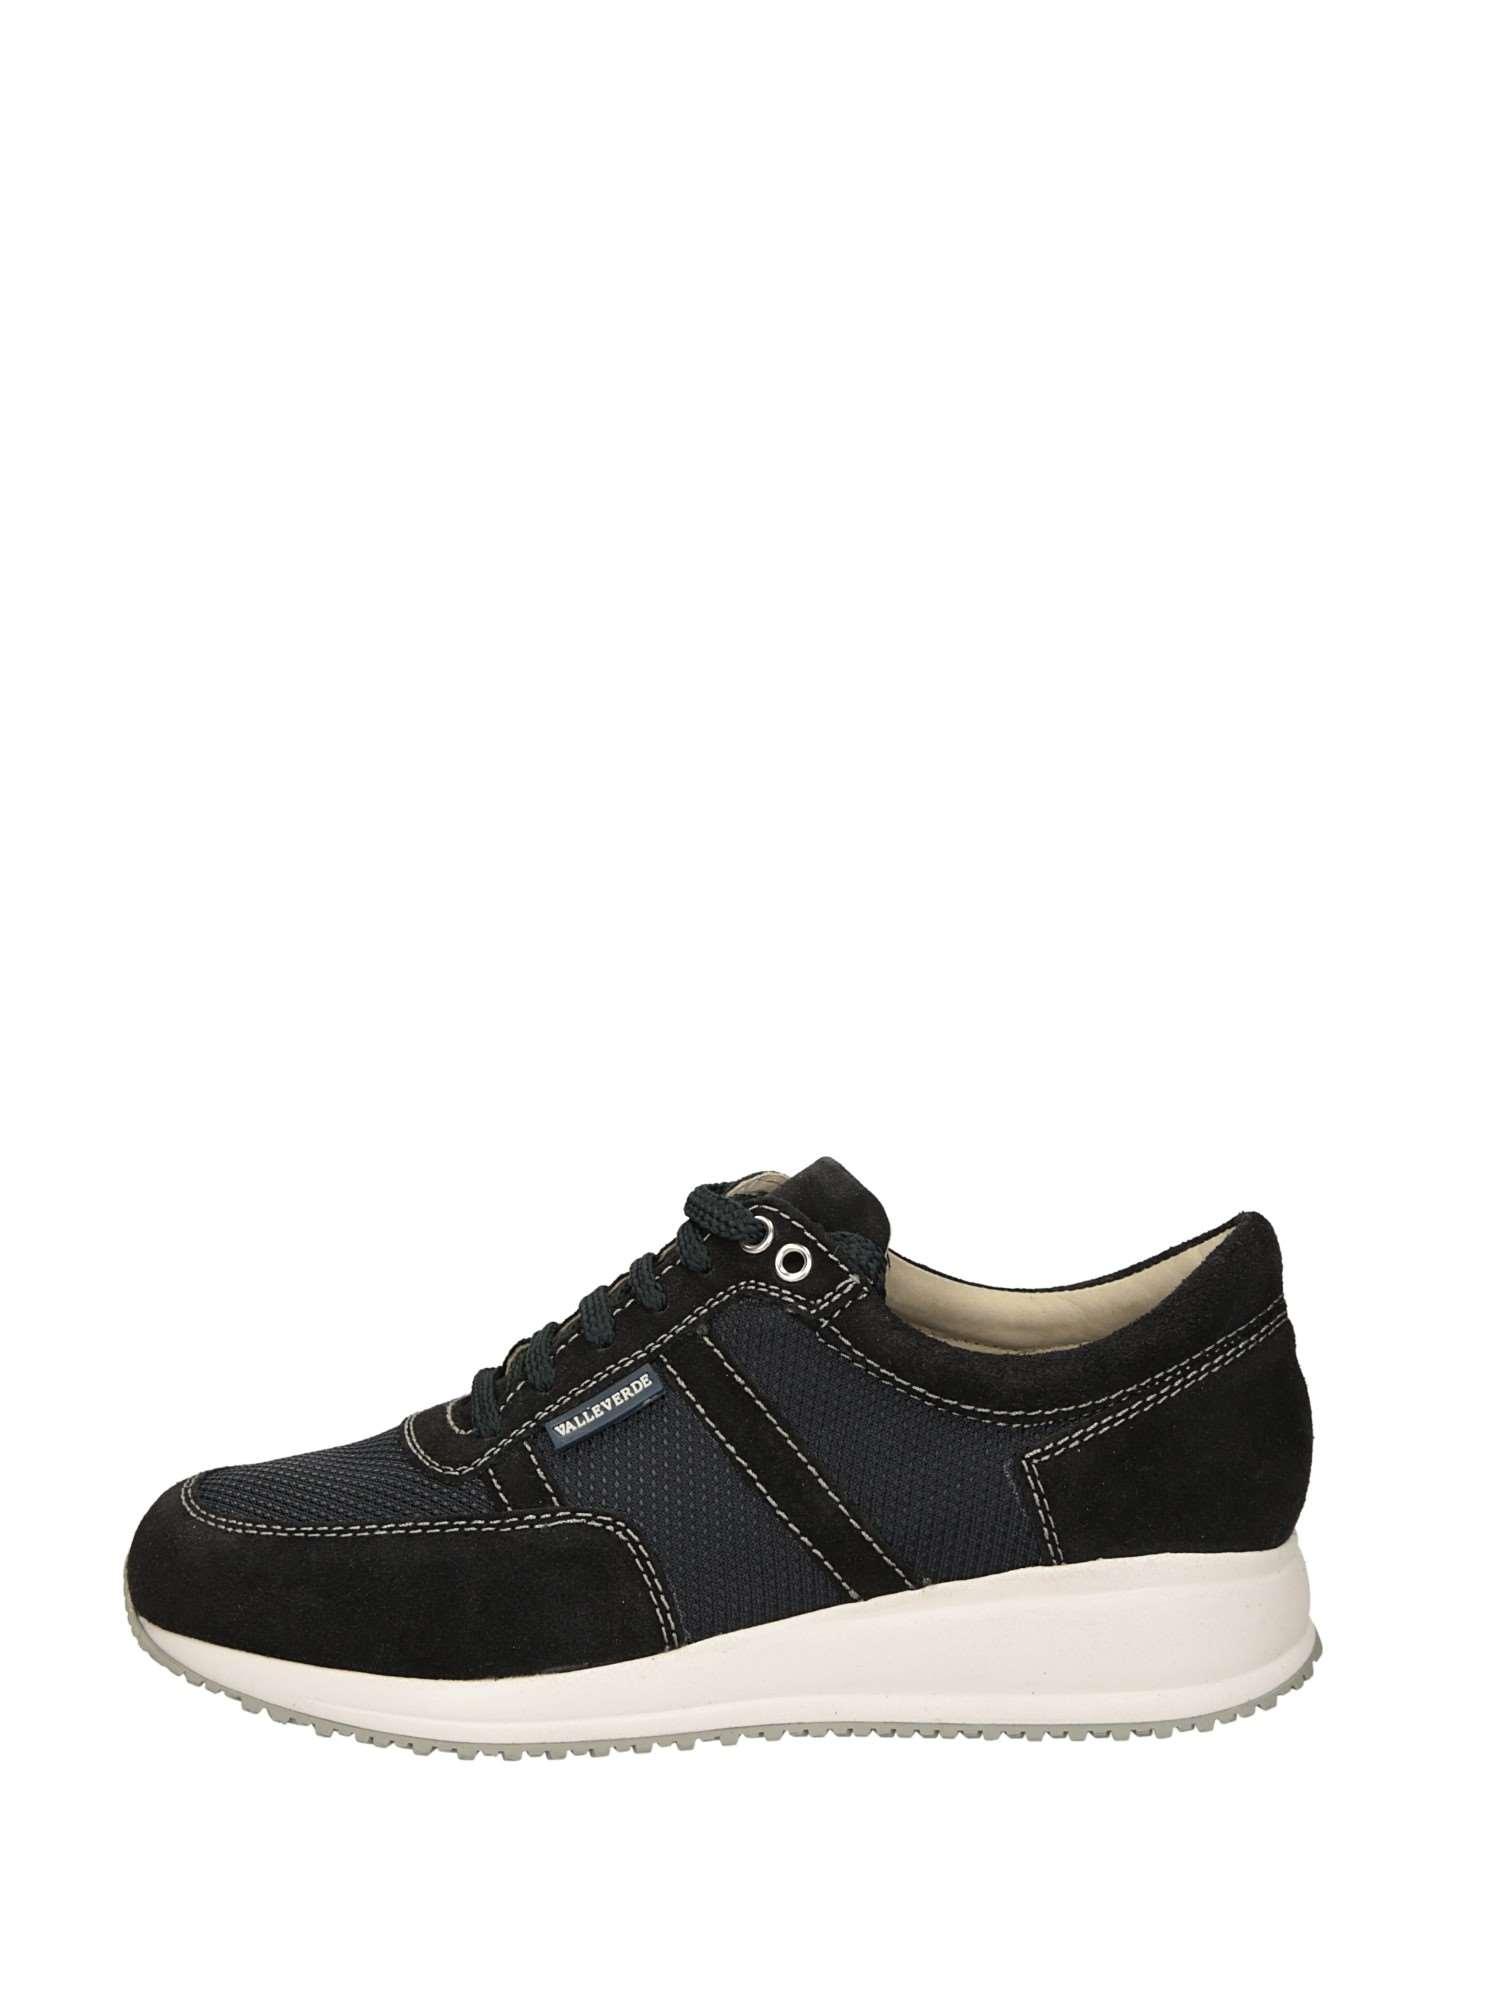 buy popular 93cd2 49044 Valleverde Sneakers Basse Uomo Blu   Lalilina